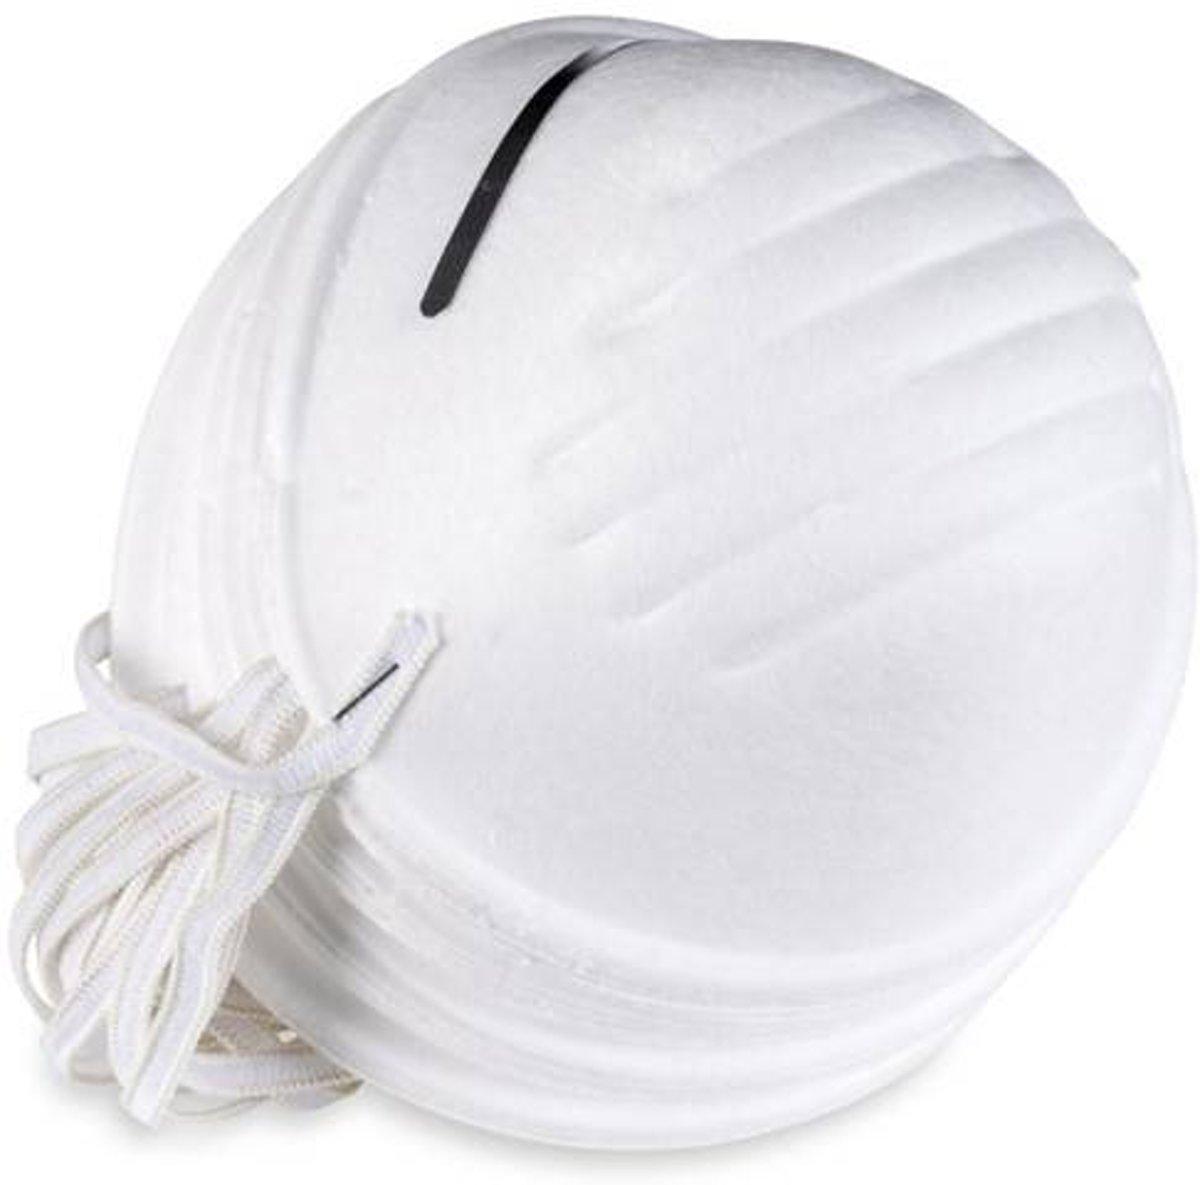 Vuil- Stofmasker - mondkapje - schuurmasker - Hygiënemasker - met aluminium neusclip (9 stuks) kopen